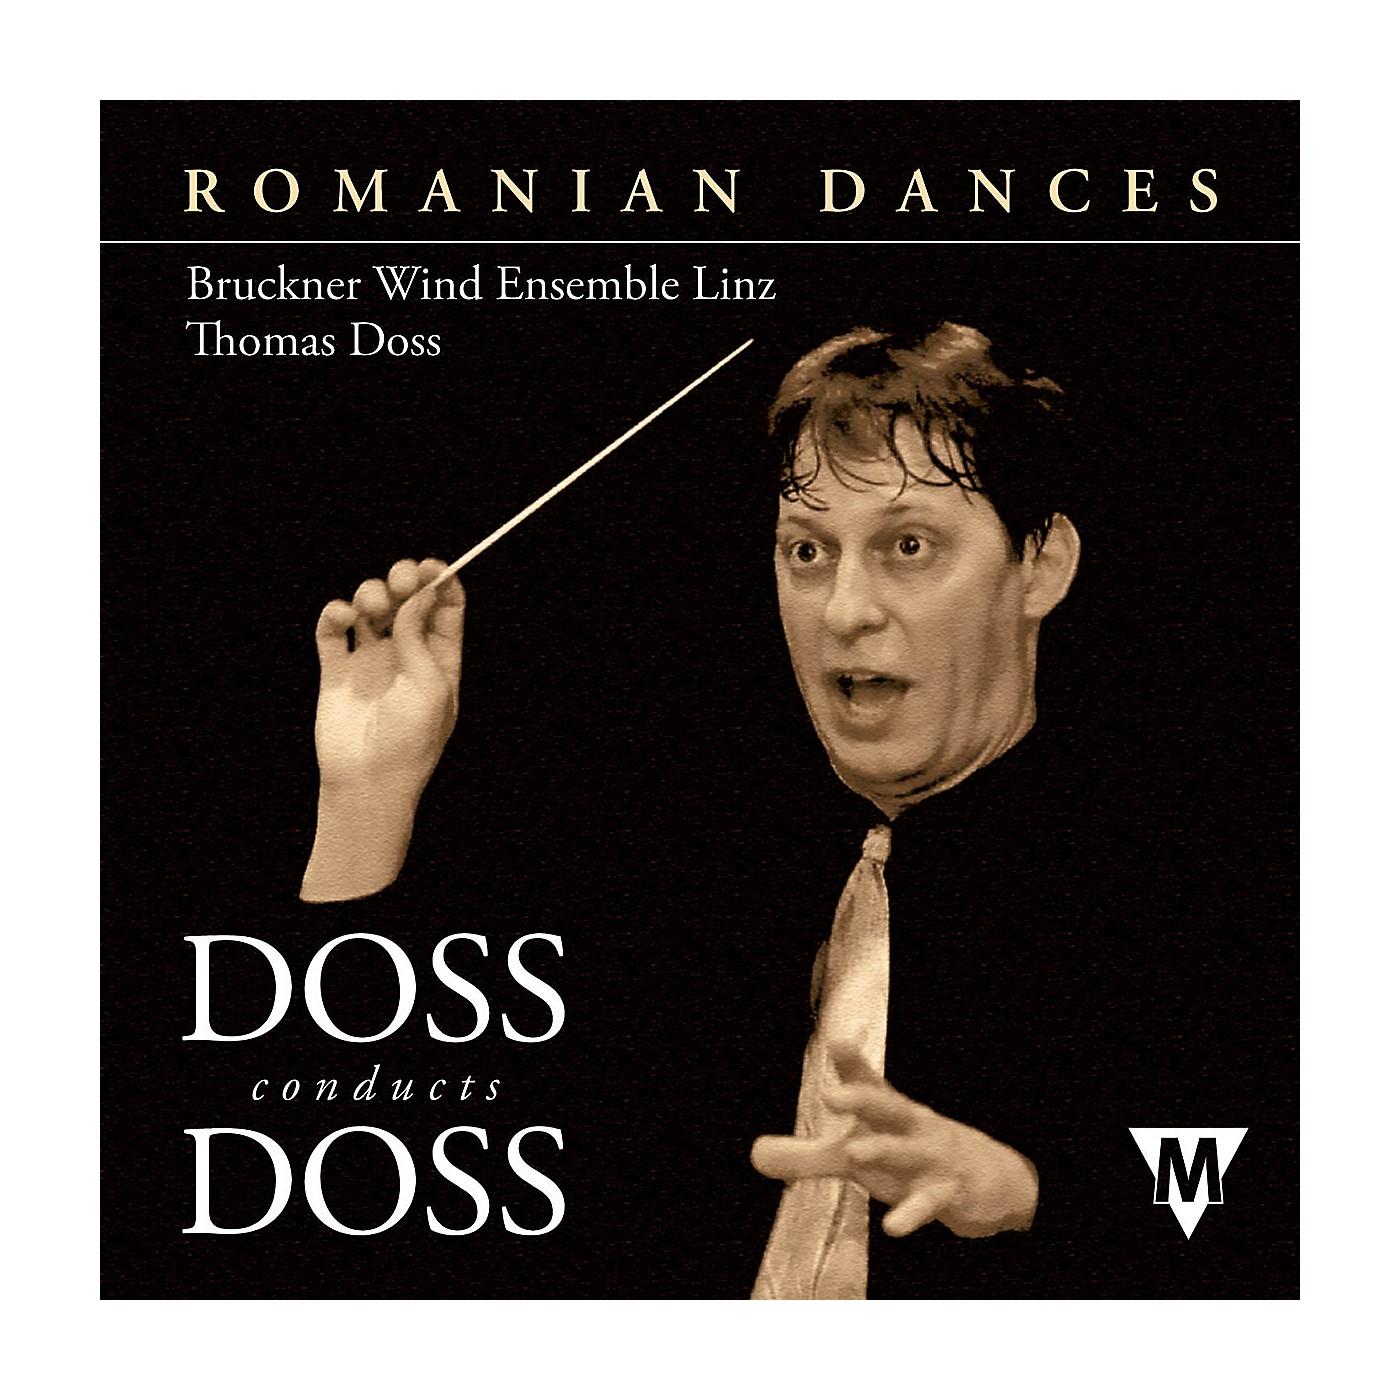 Hal Leonard Romanian Dances  2 Cd Doss Conducts Doss Concert Band thumbnail